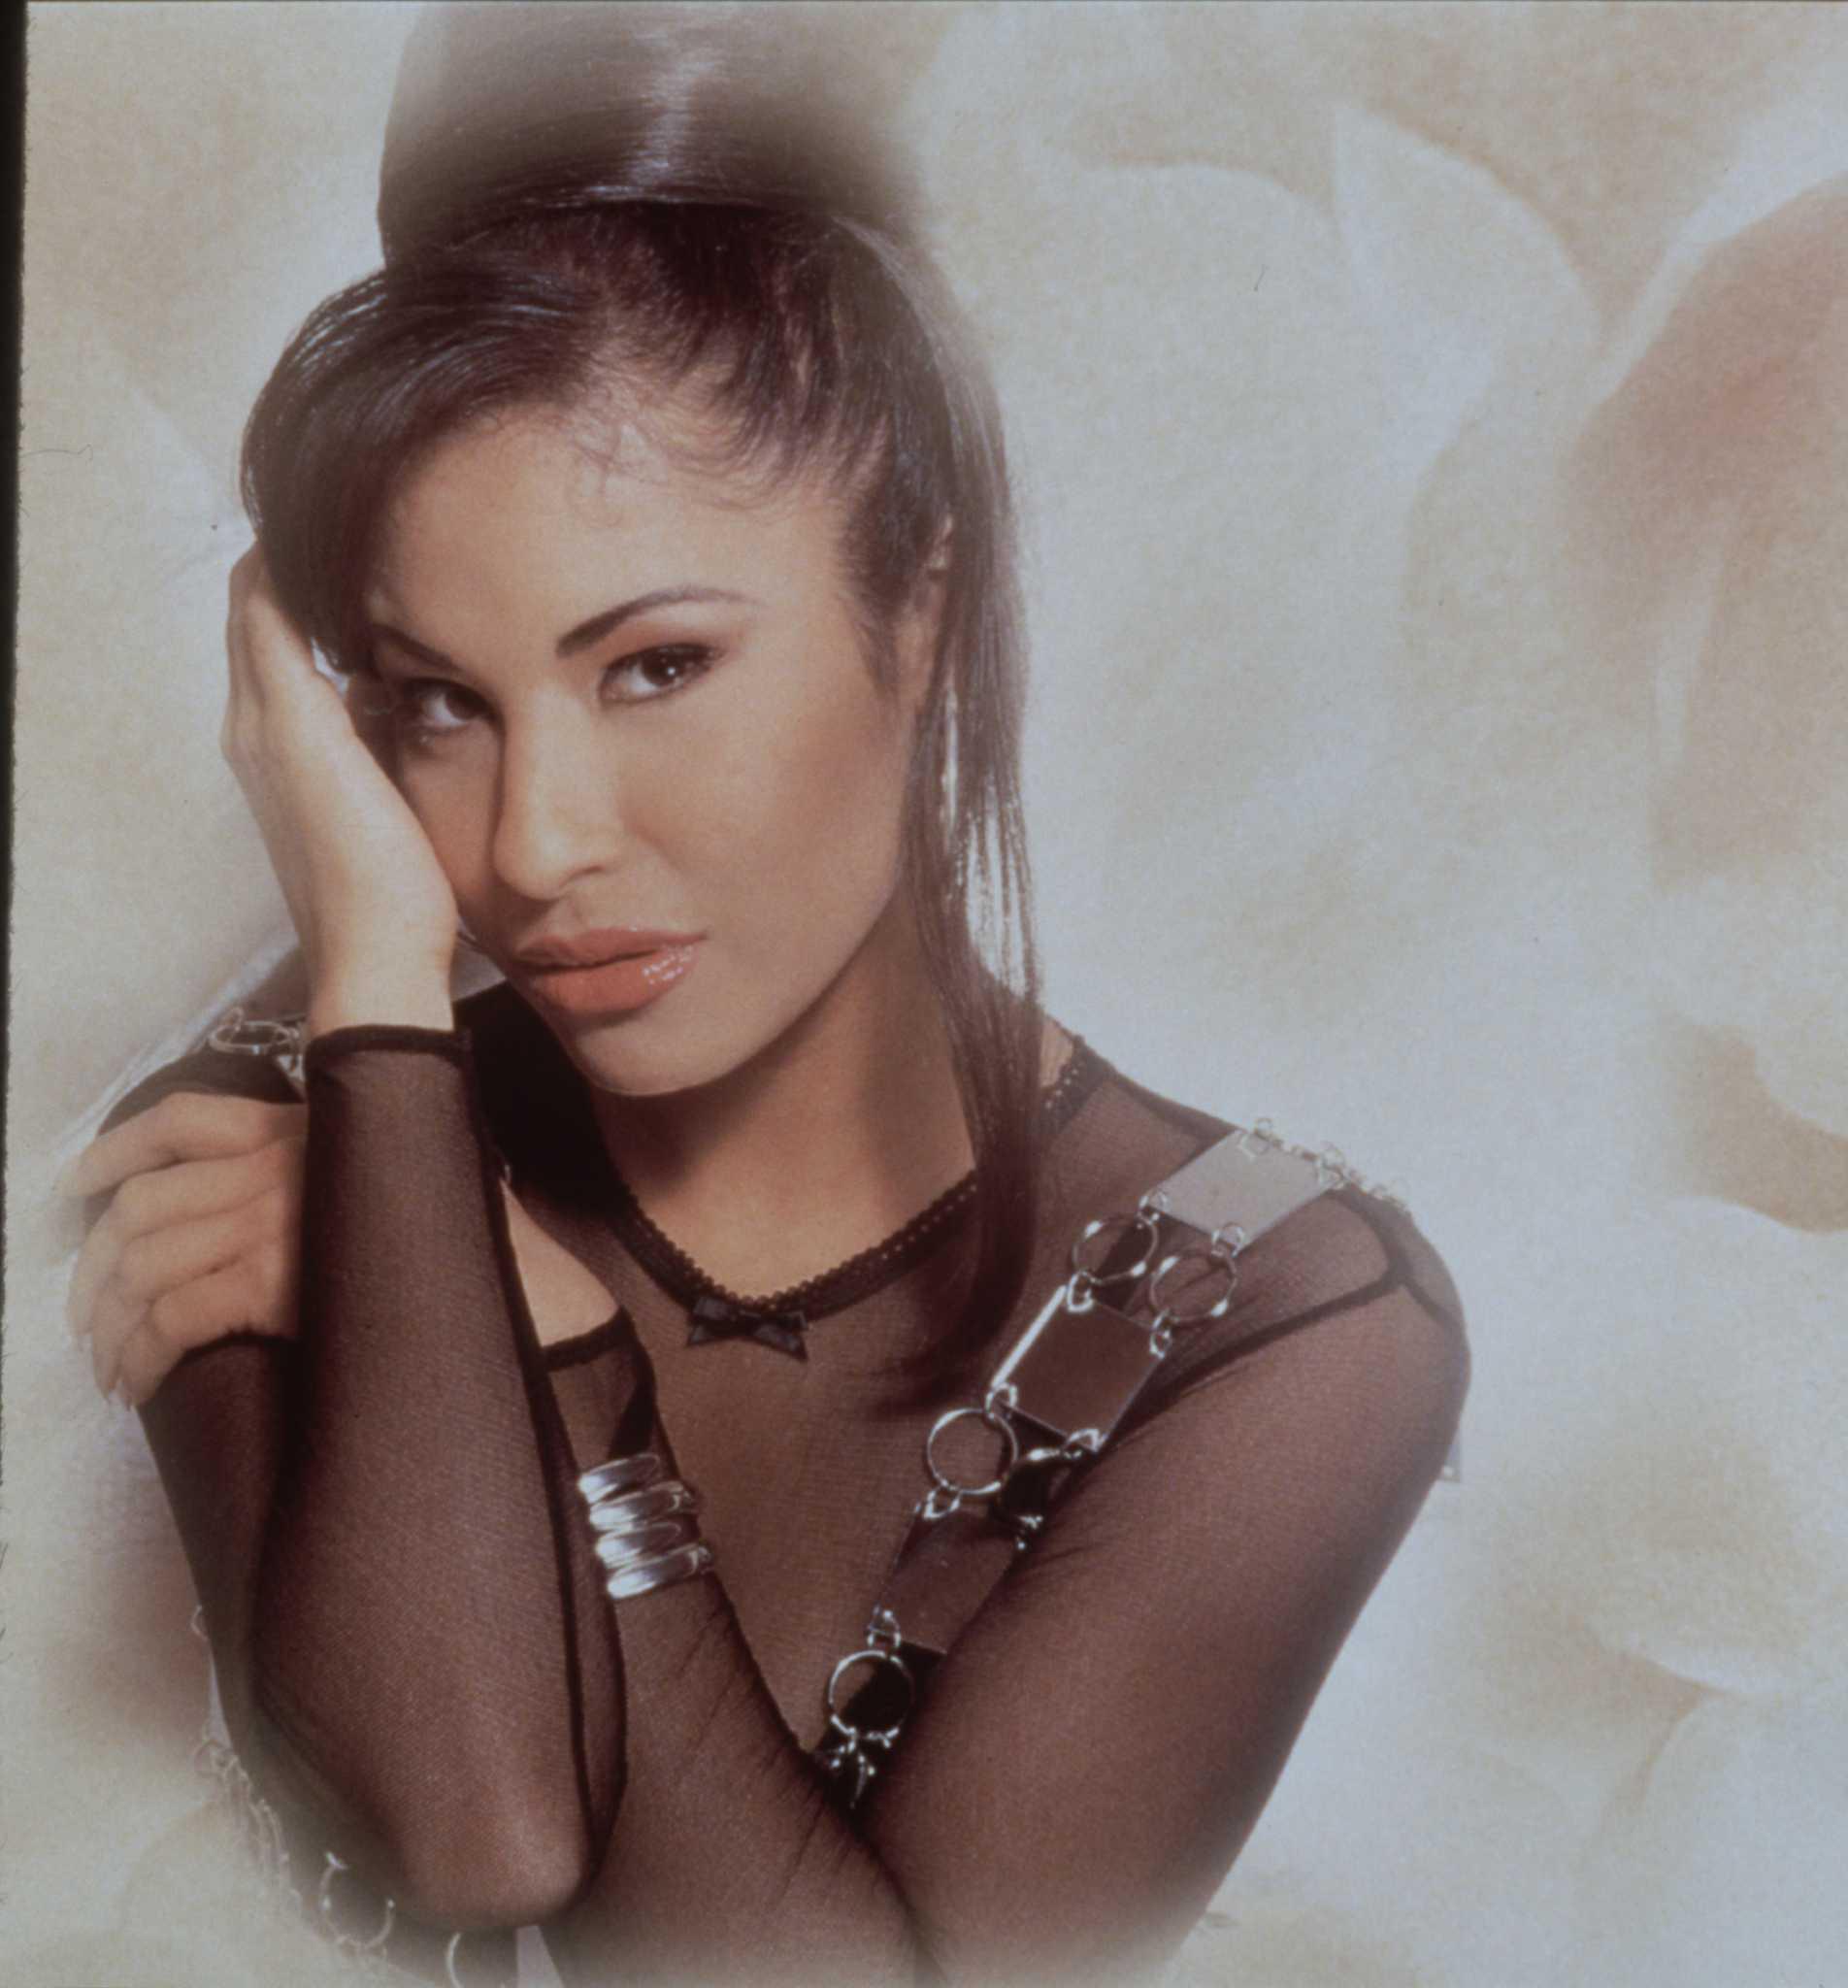 Selena To Be Honored At Fiesta De La Flor In Corpus